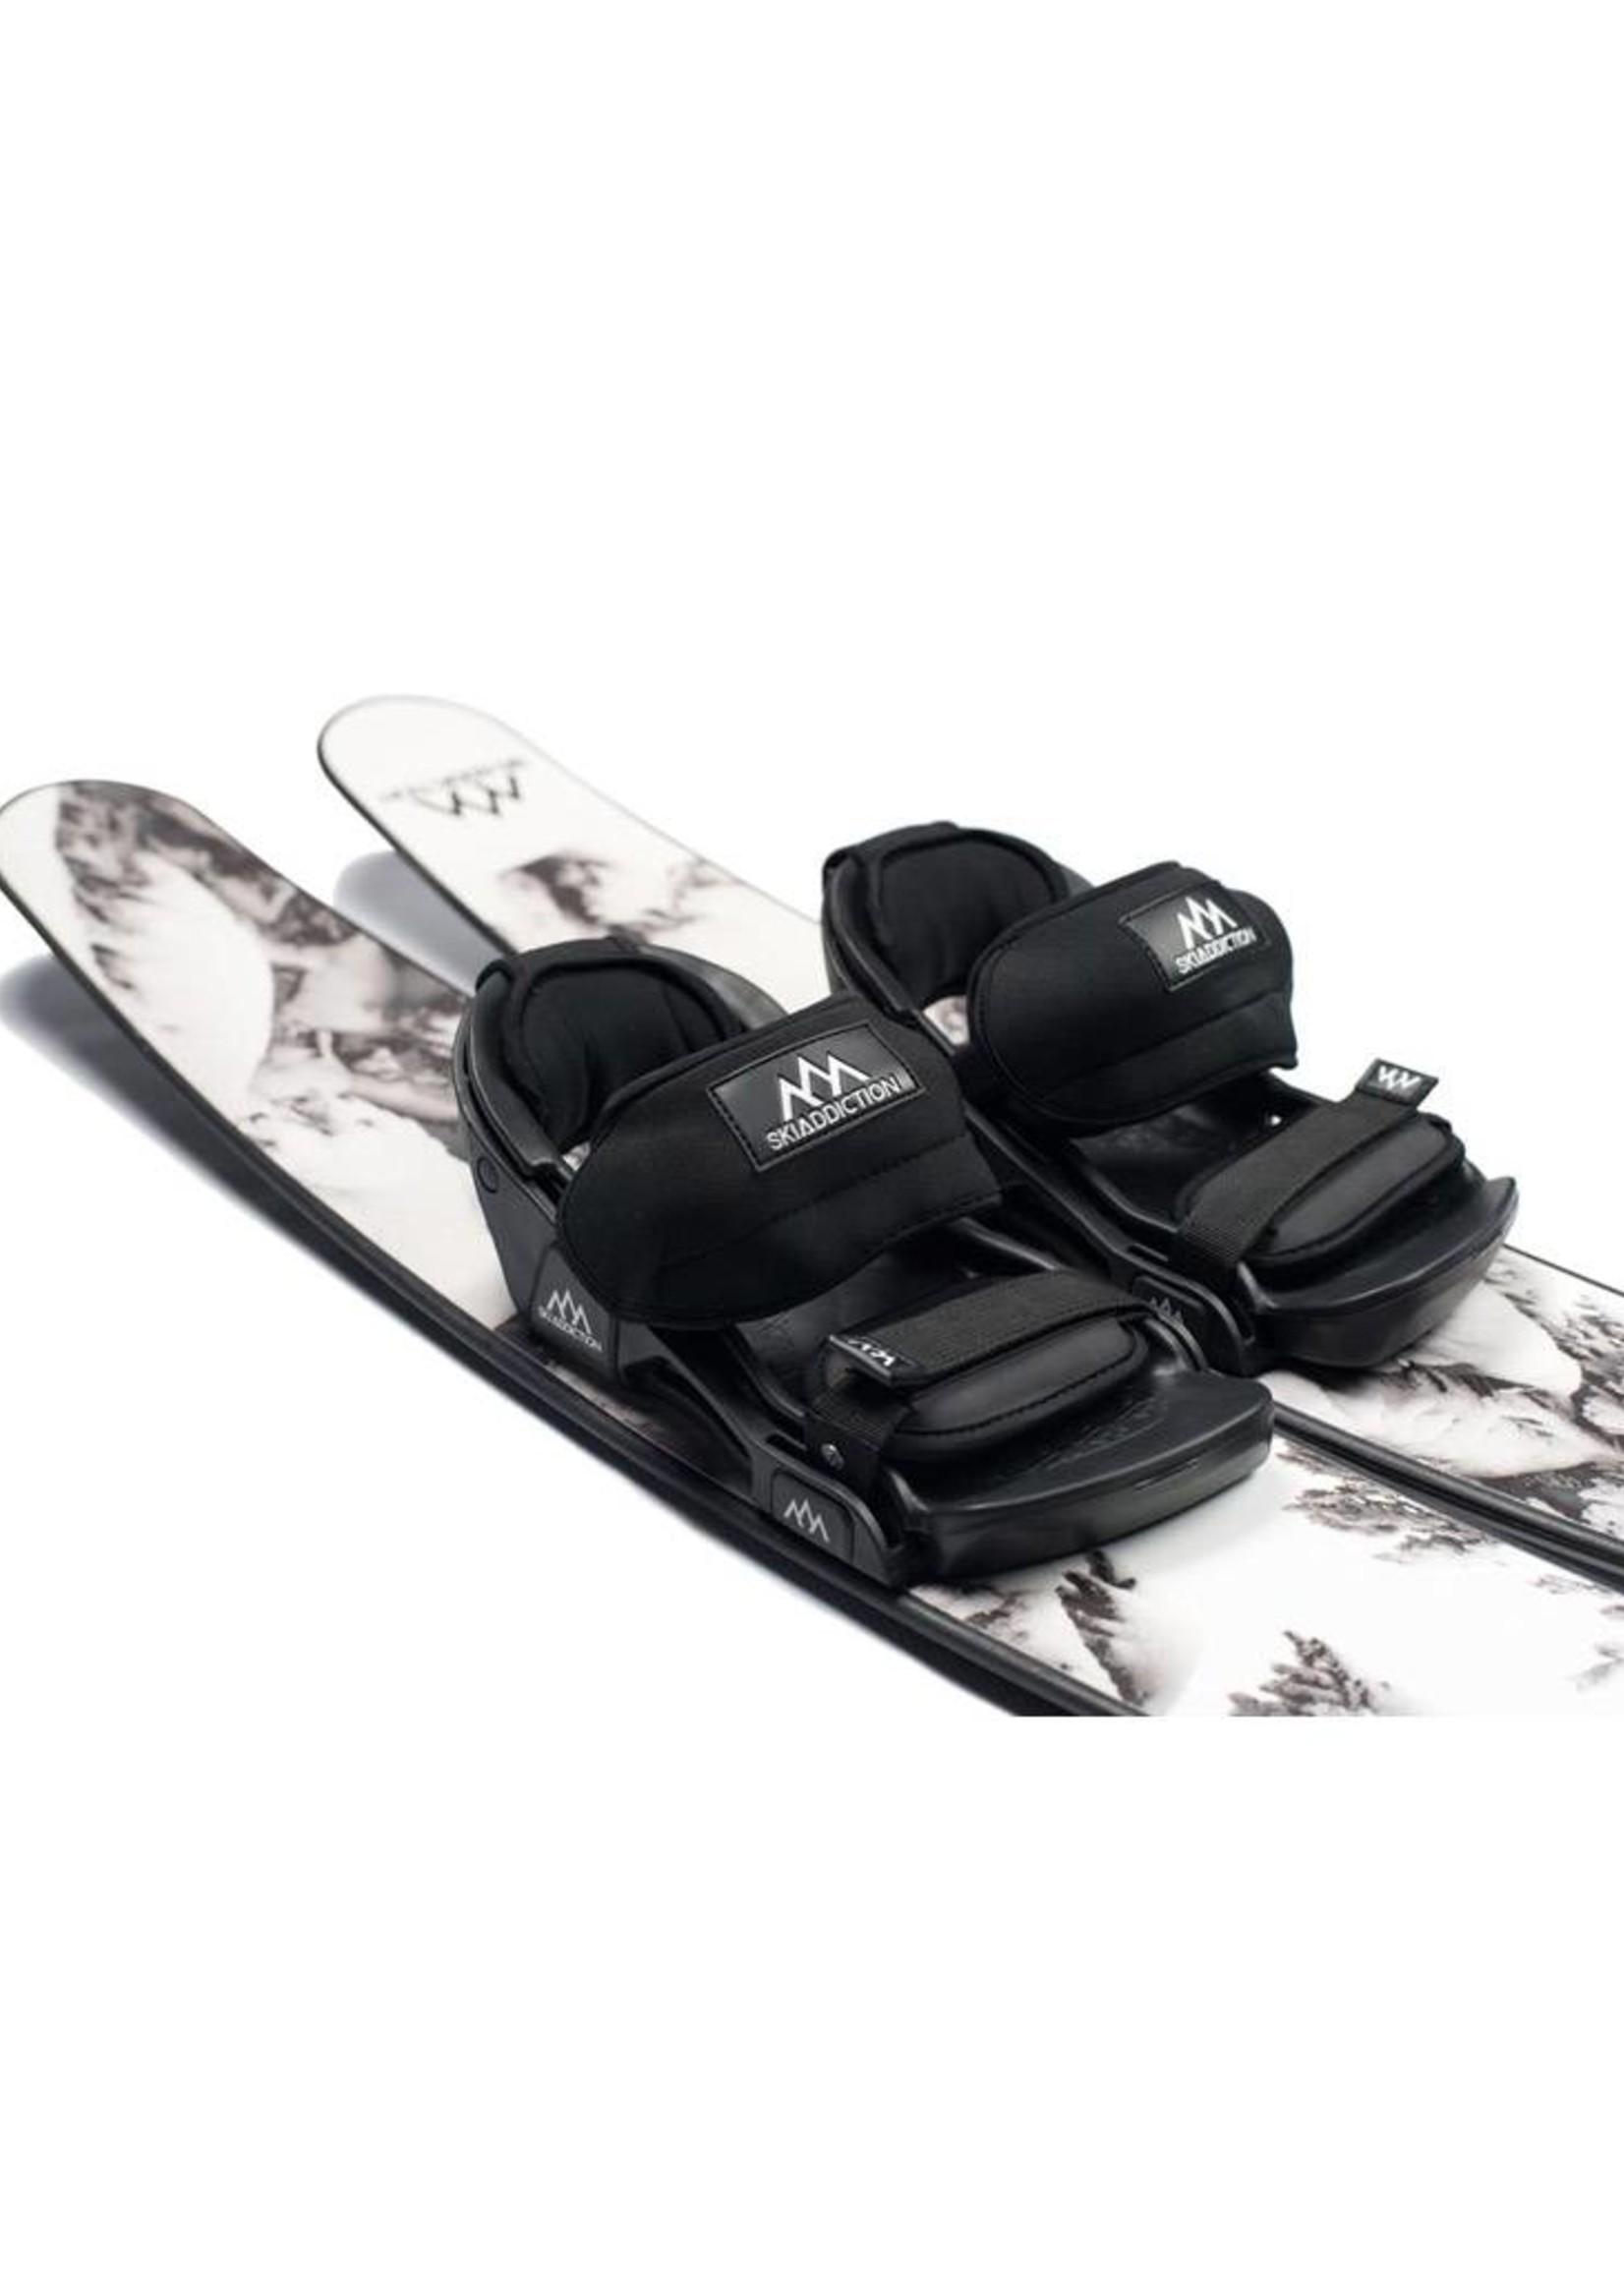 Ski Addiction Ski Addiction Tramp Skis + Bindings